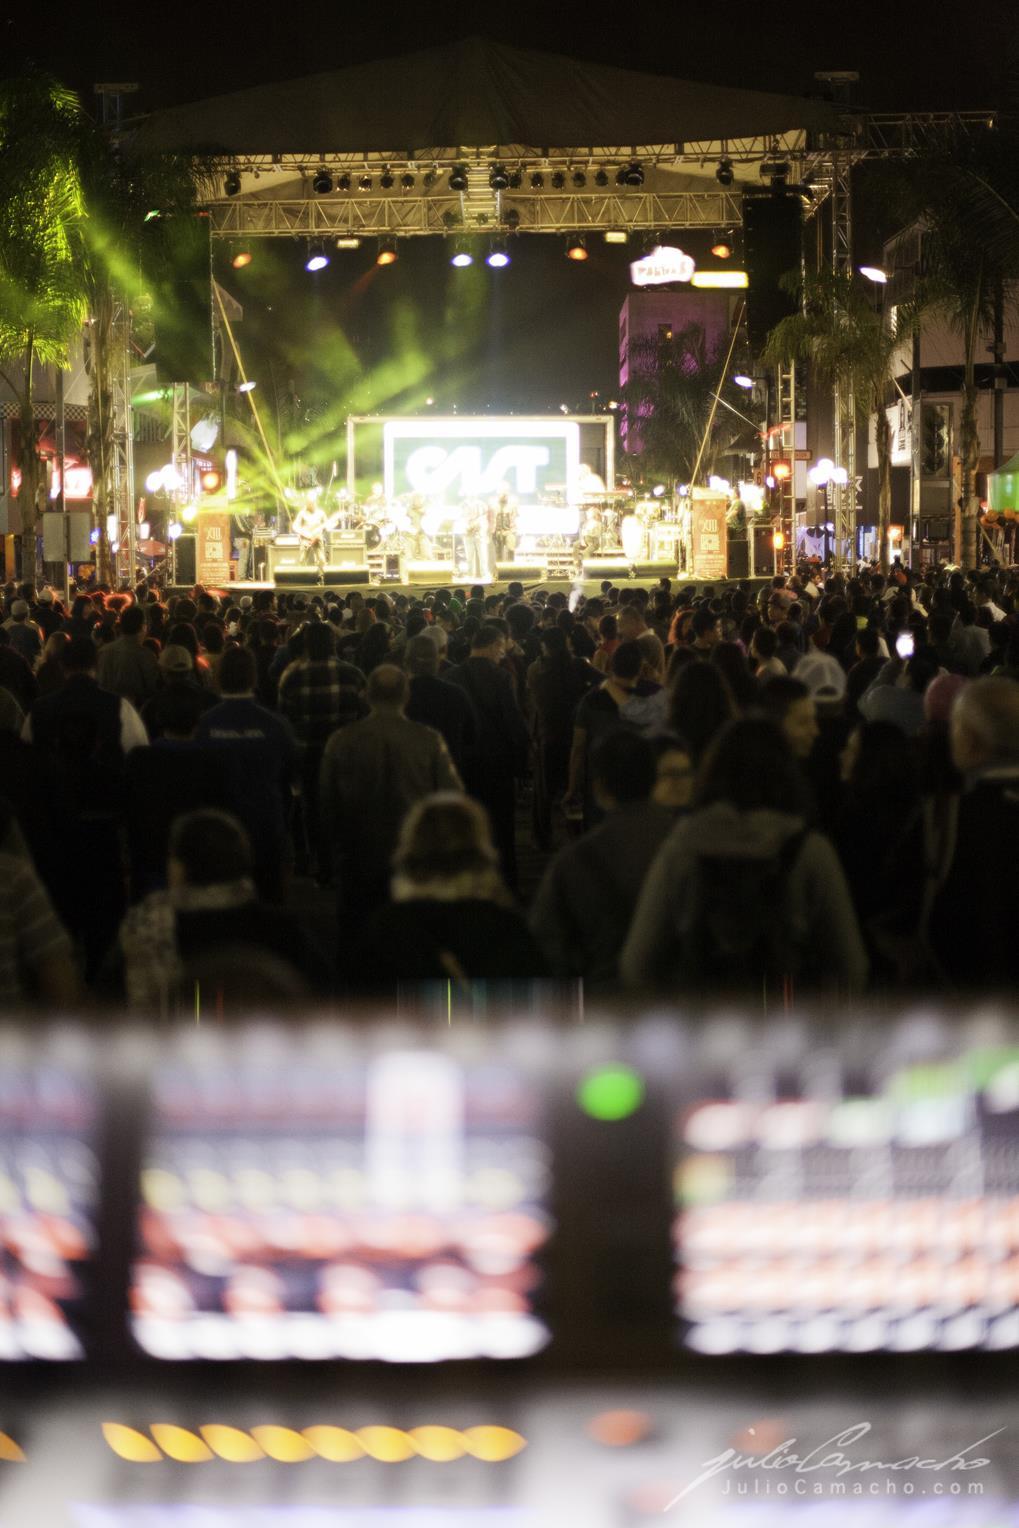 2014-10-30 31 CAST TOUR Ensenada y Tijuana - 1491 - www.Juli (Copy).jpg